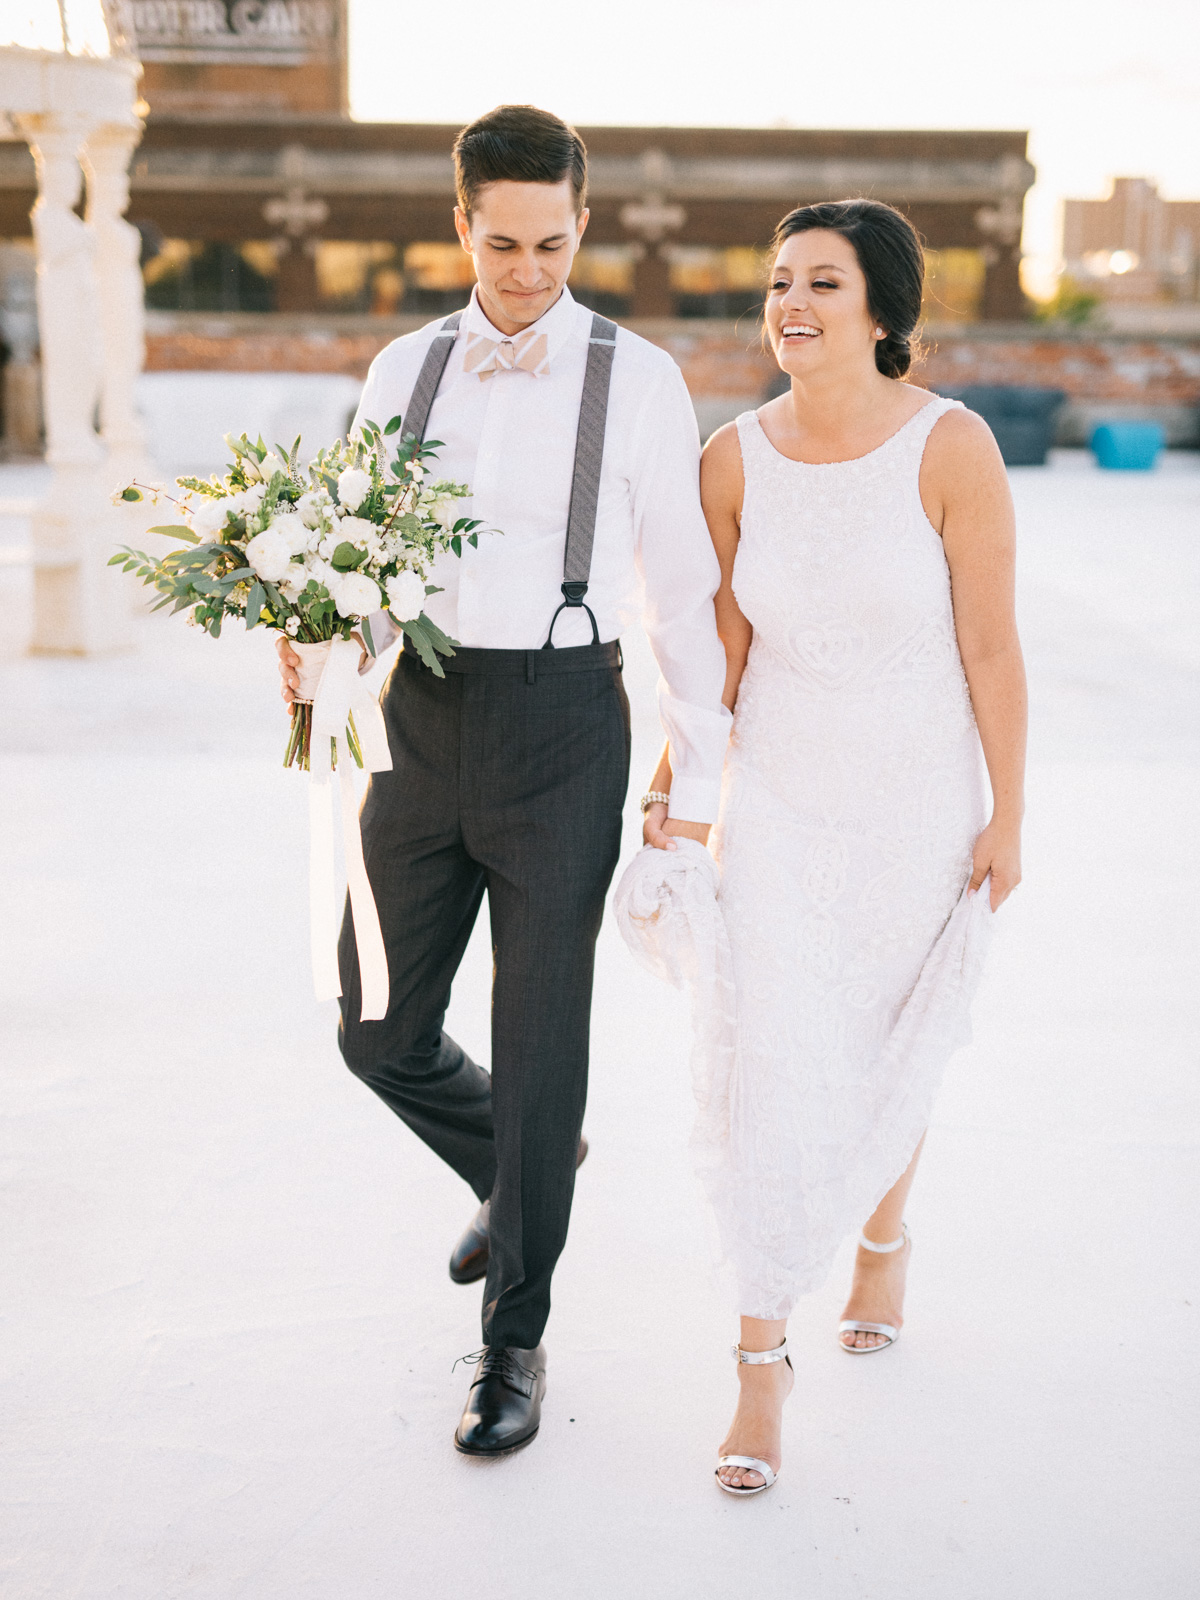 OKC rooftop wedding josh mccullock-6971.jpg